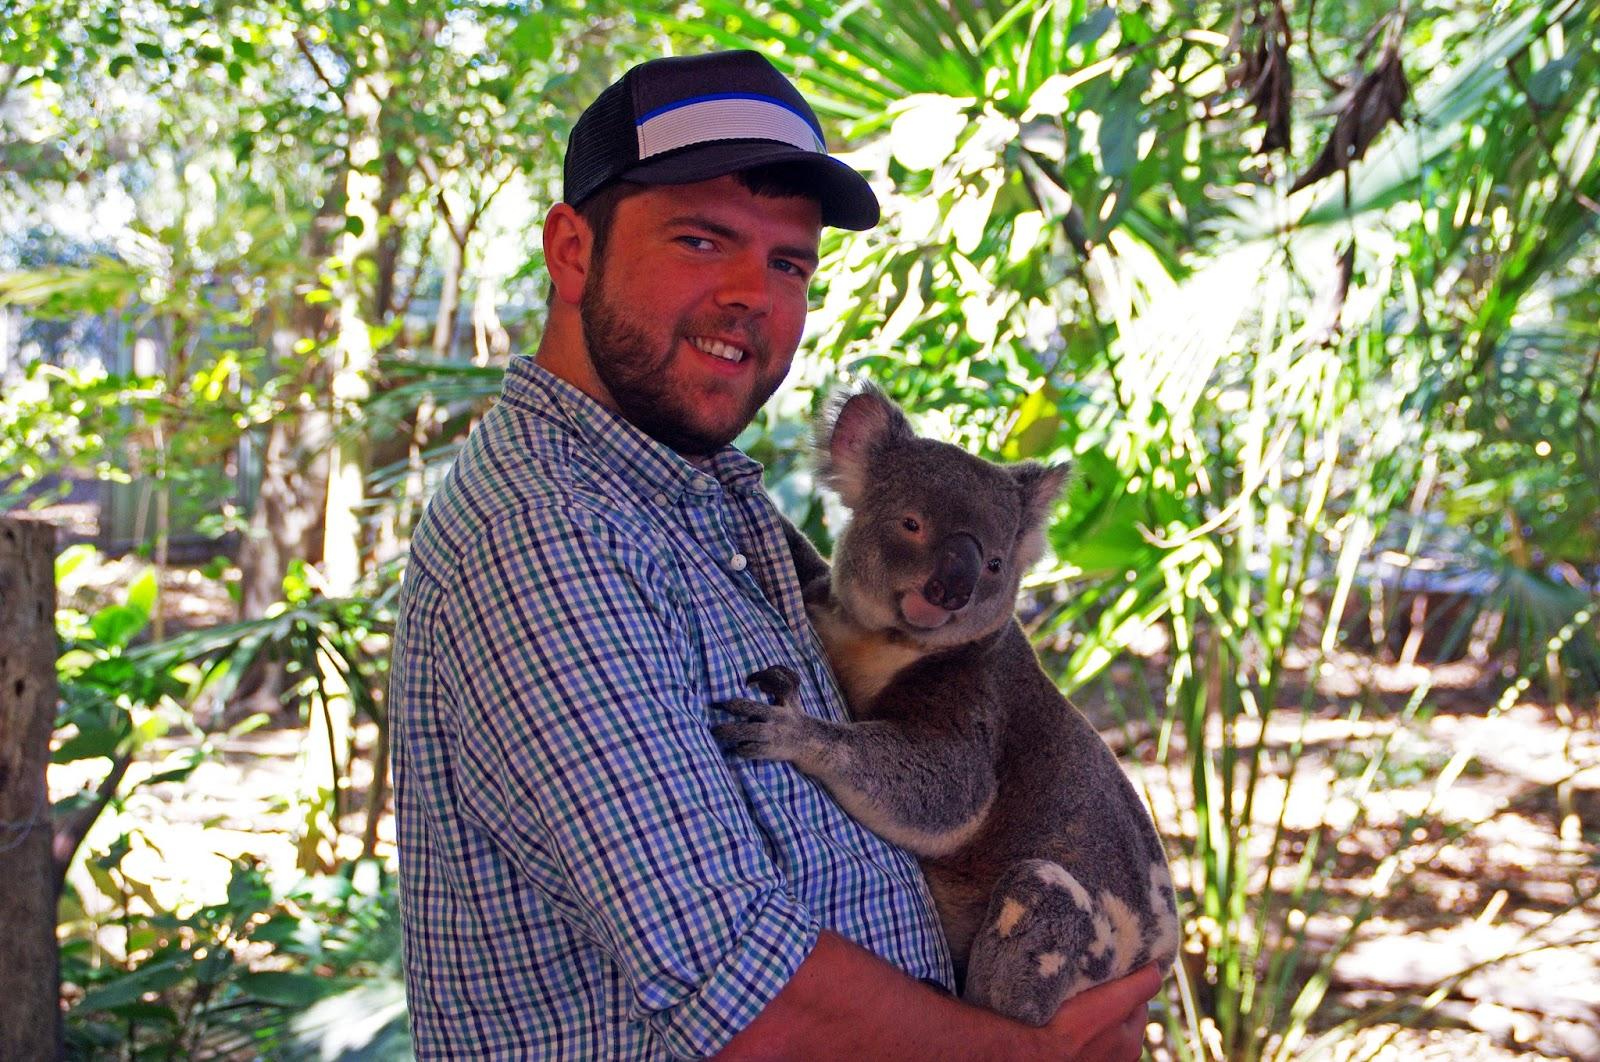 Dan with a Koala at Lone Pine Koala Sanctuary